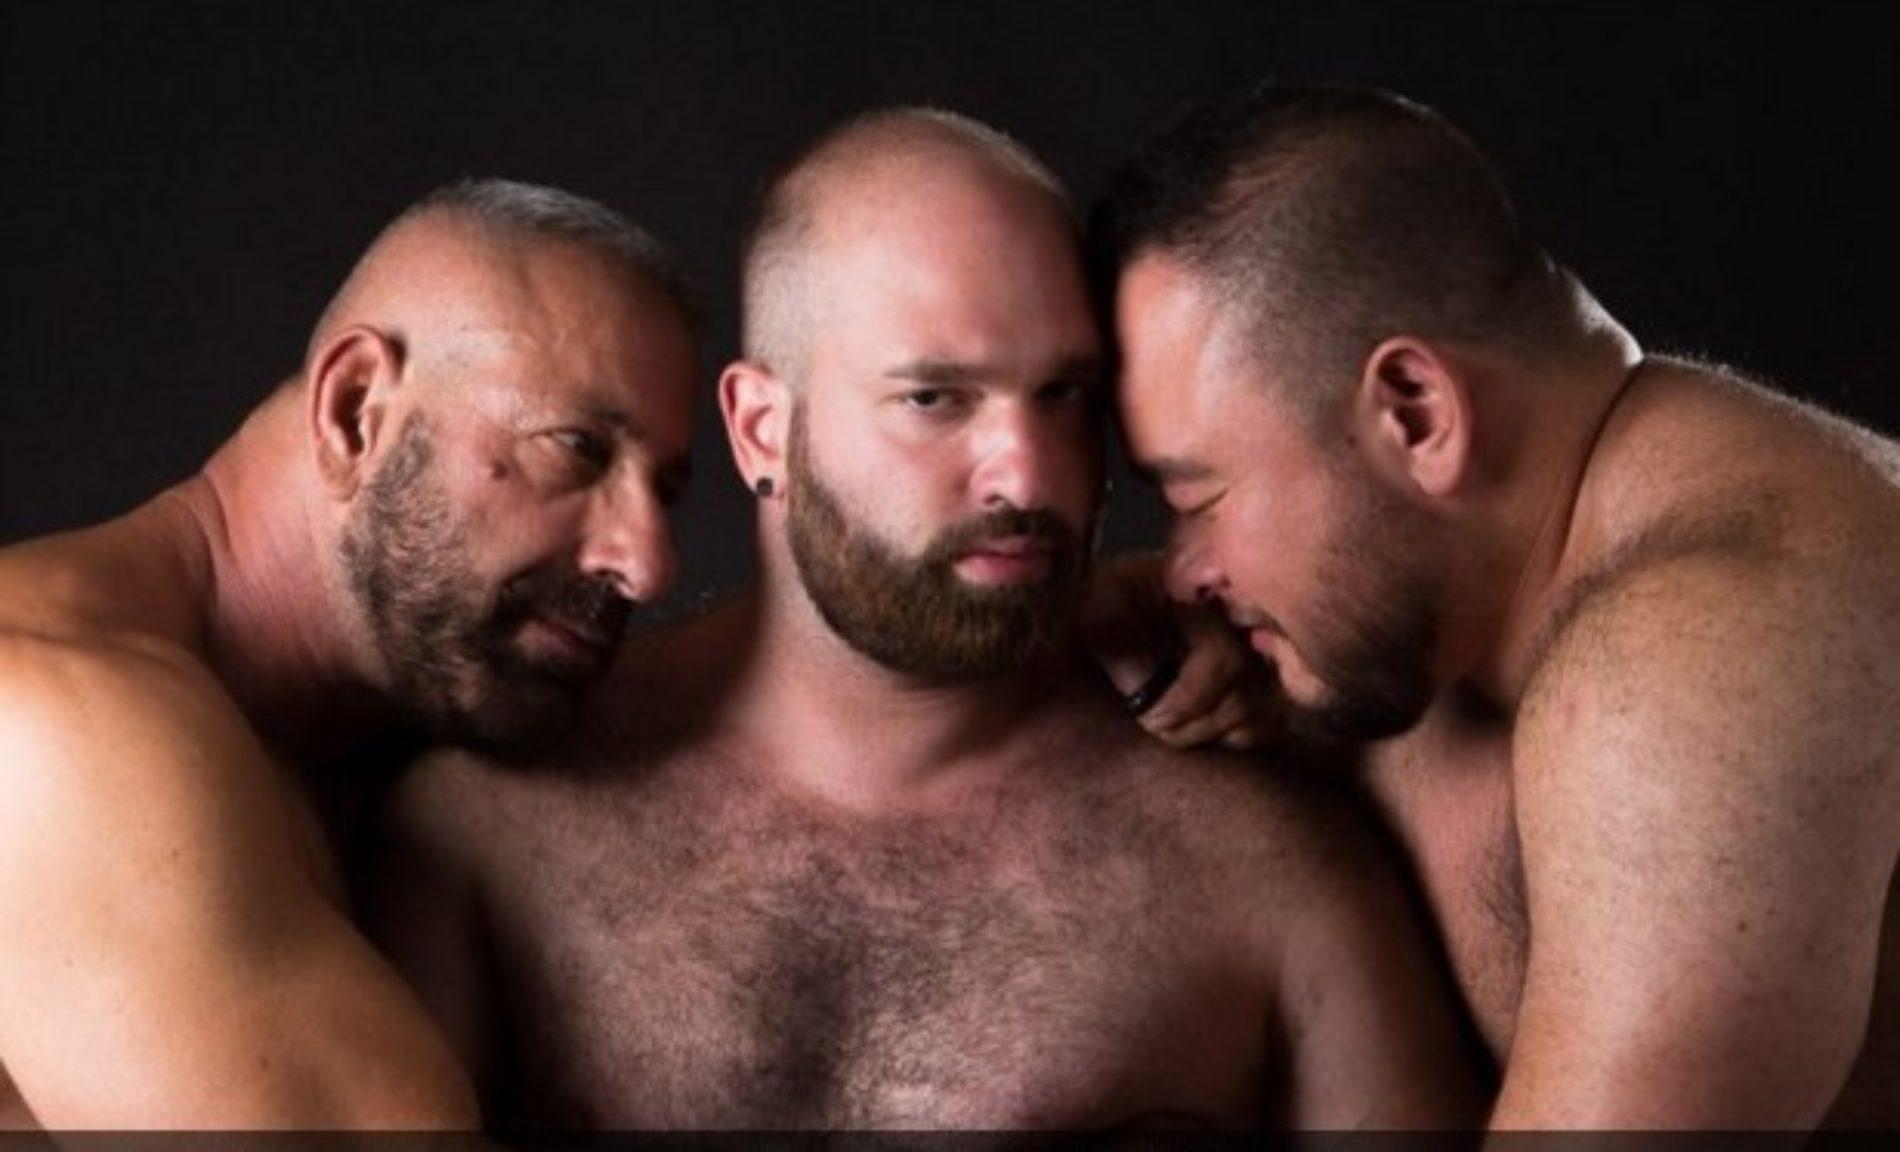 Three gay men speak of their three-way relationship